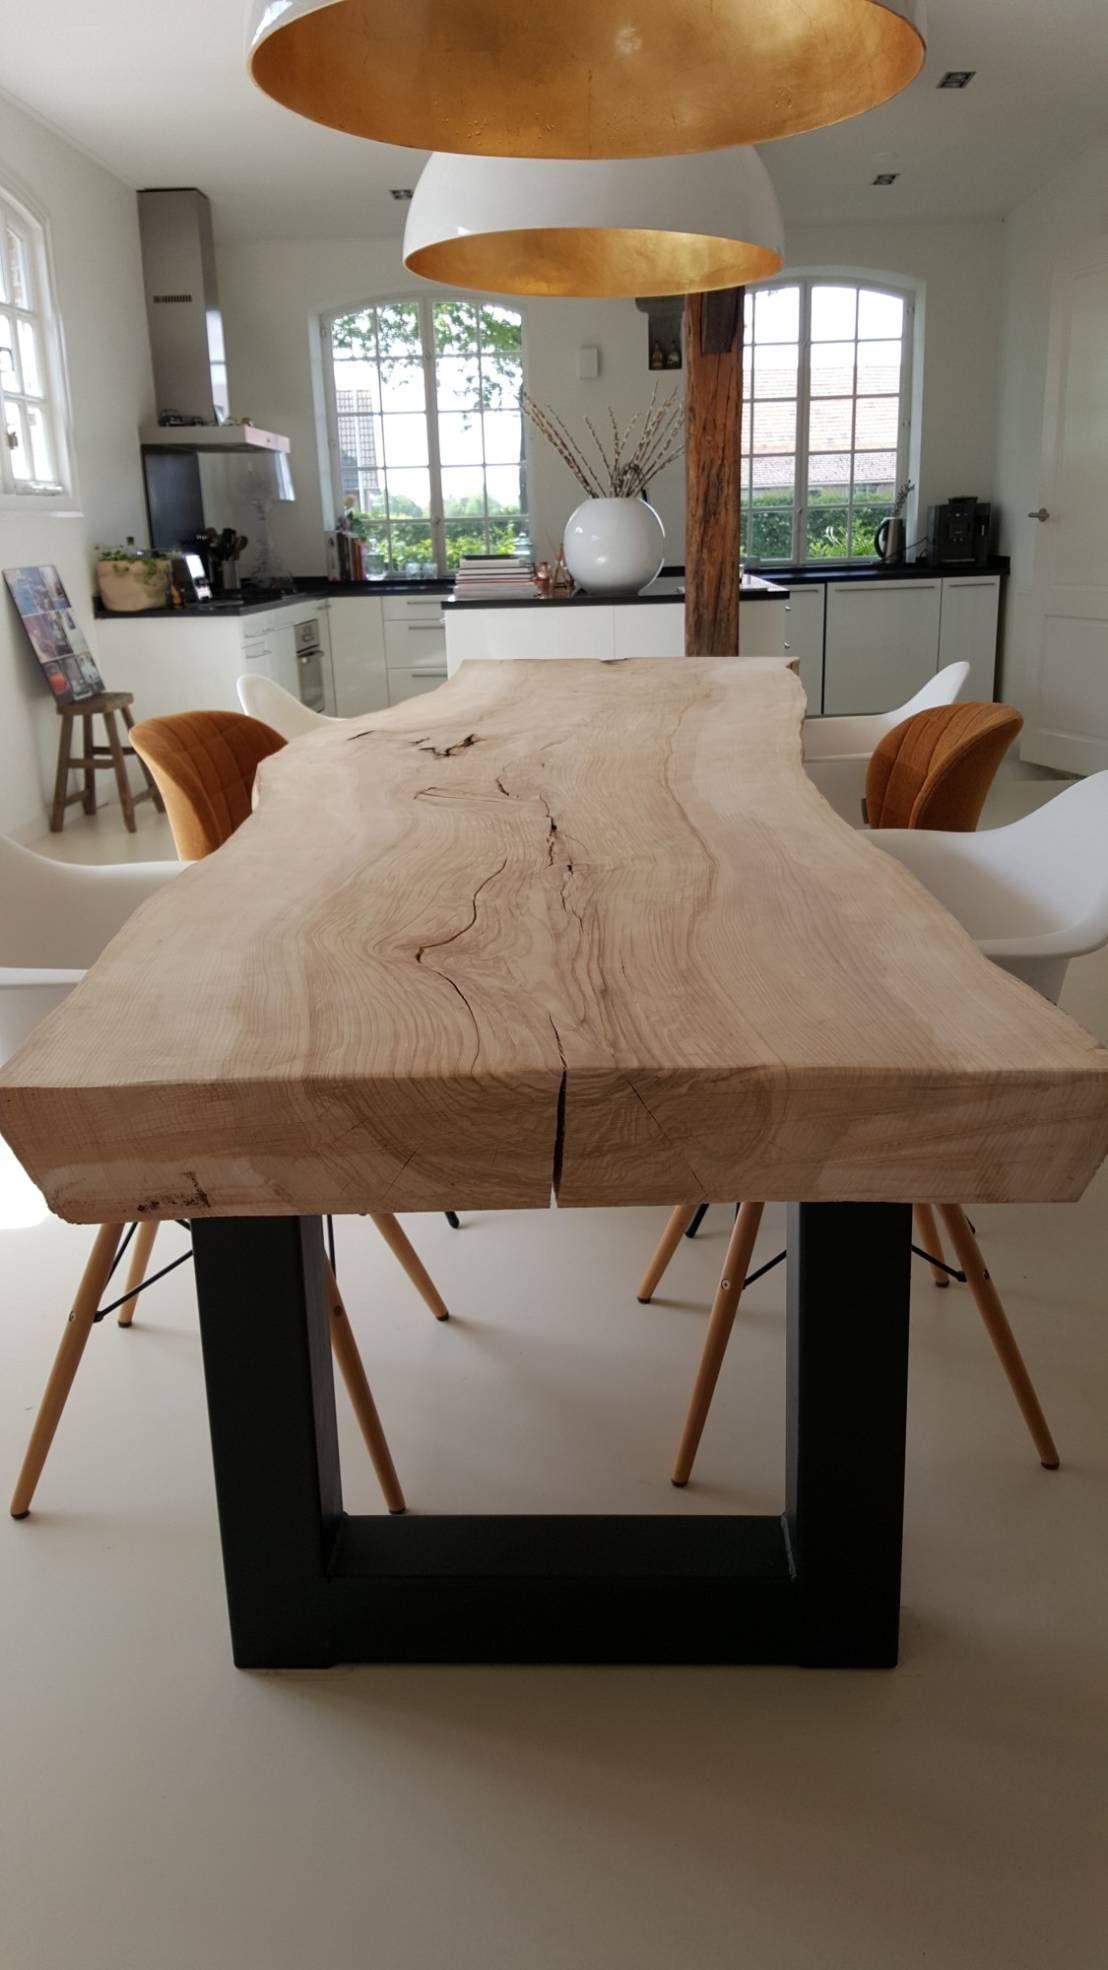 Cozinha 10 mesas perfeitas de 2019 home inspirations for Mobilia kitchen table